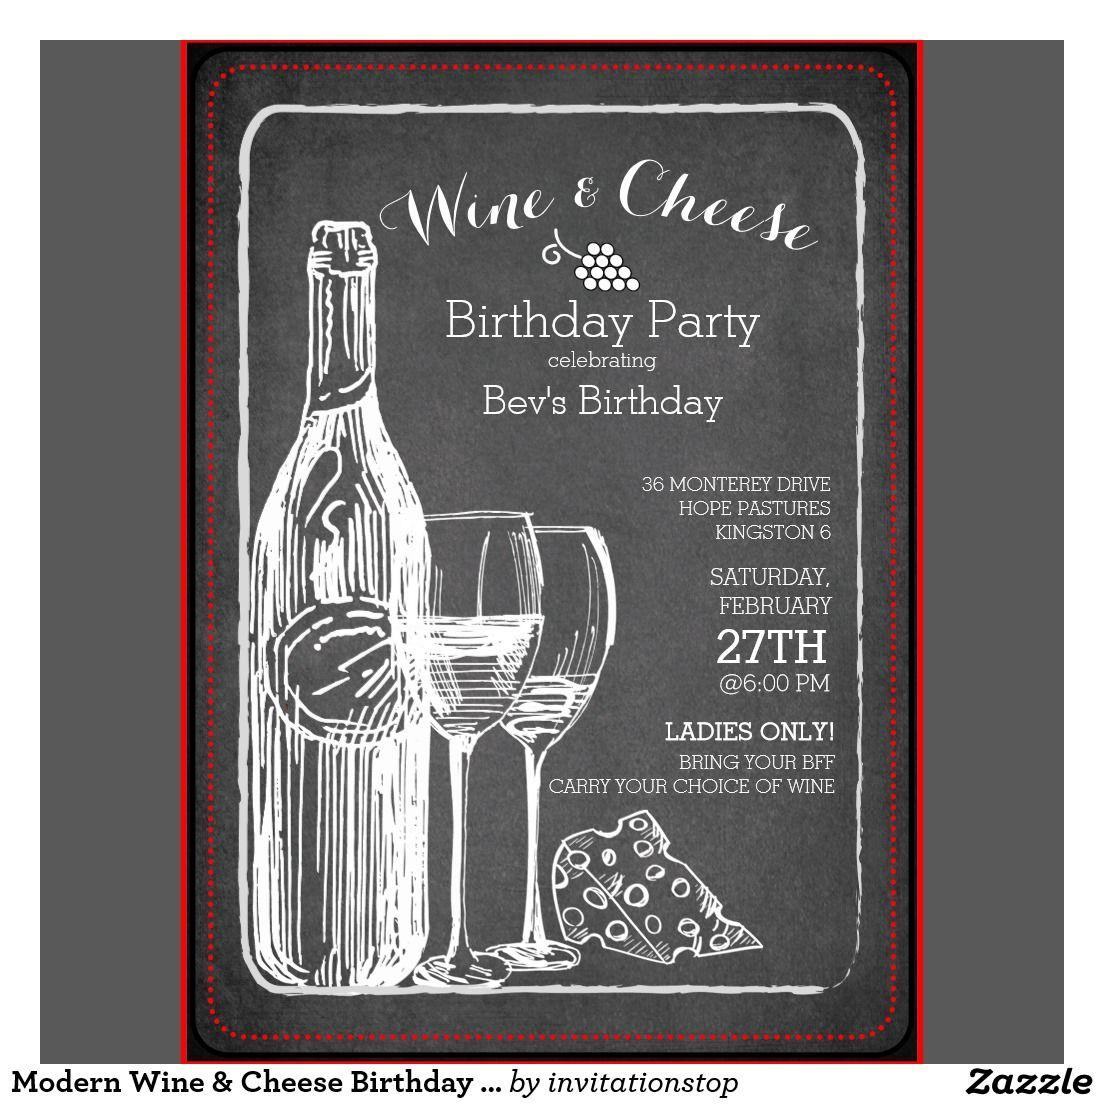 2ND FINAL | Modern Wine & Cheese Birthday Party Invitation | Work ...